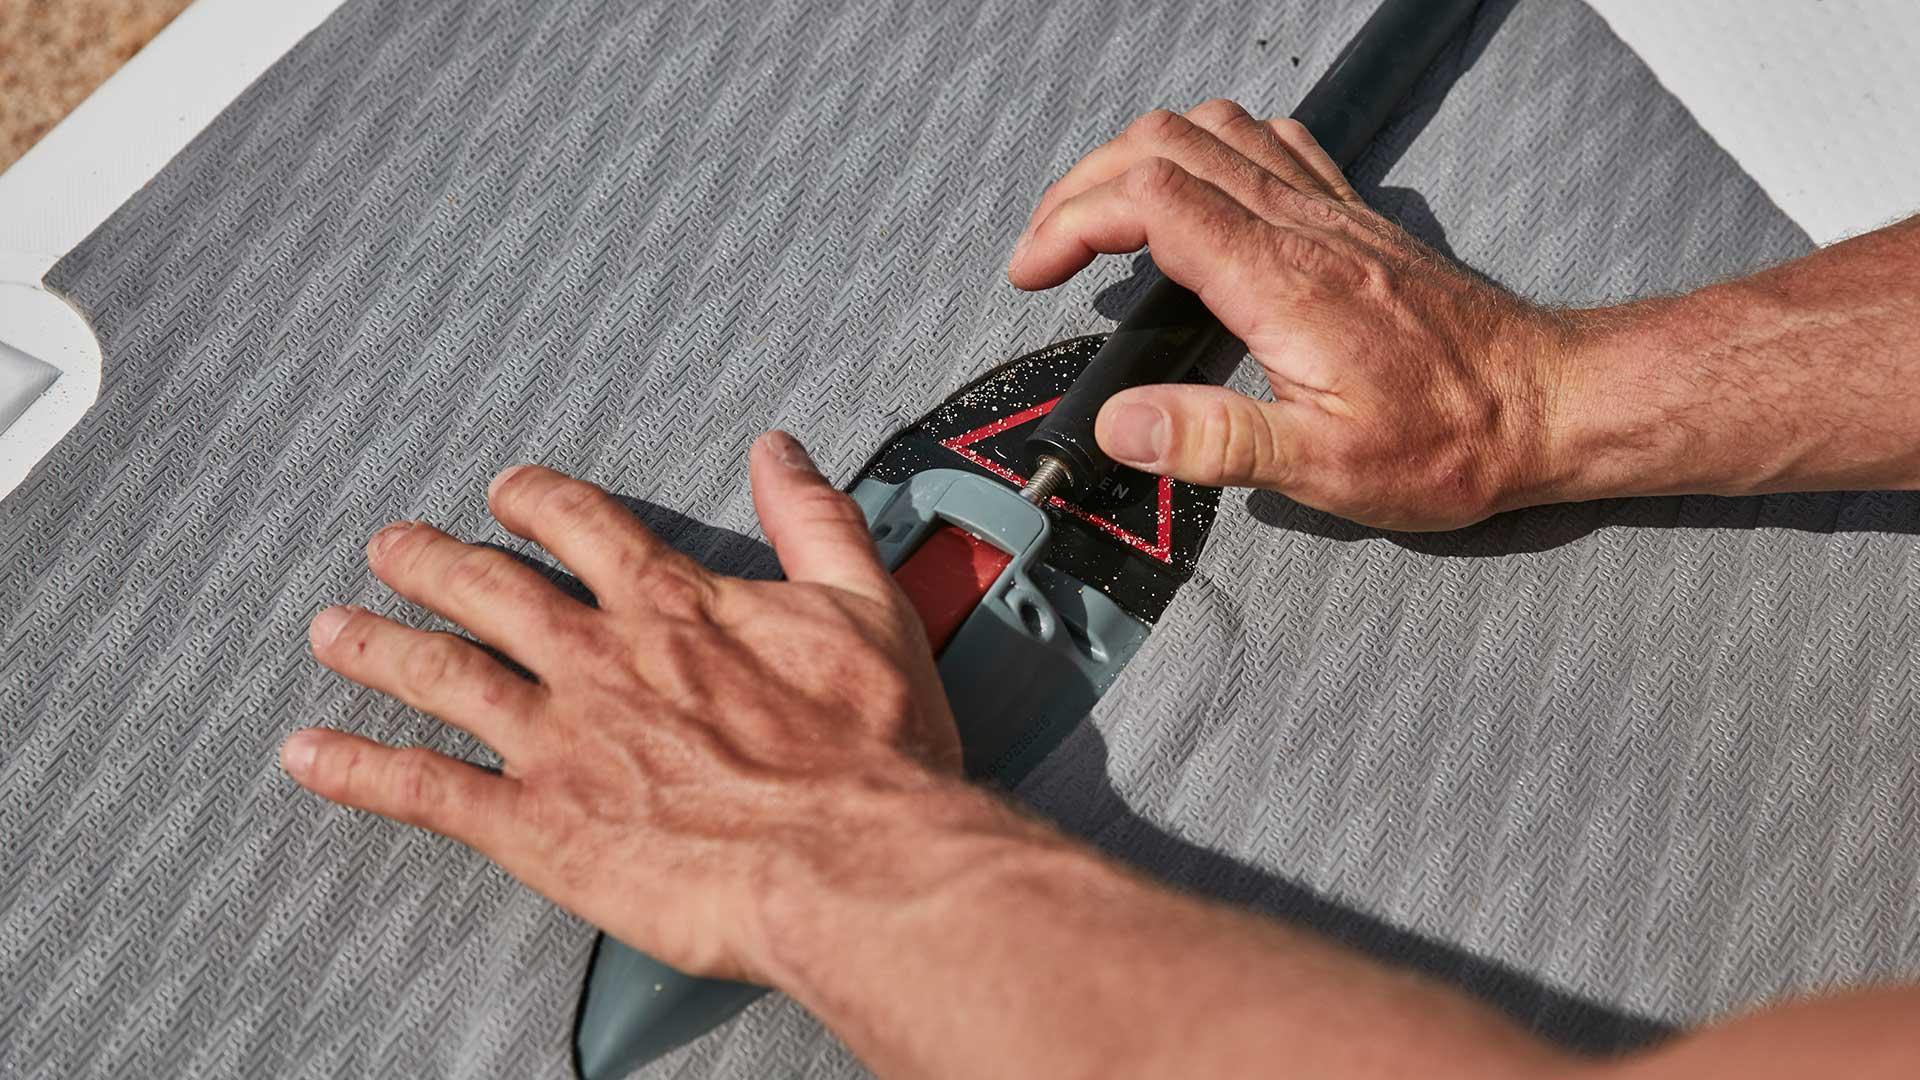 redpaddleco-140x27-elite-inflatable-paddle-board-desktop-gallery-valve